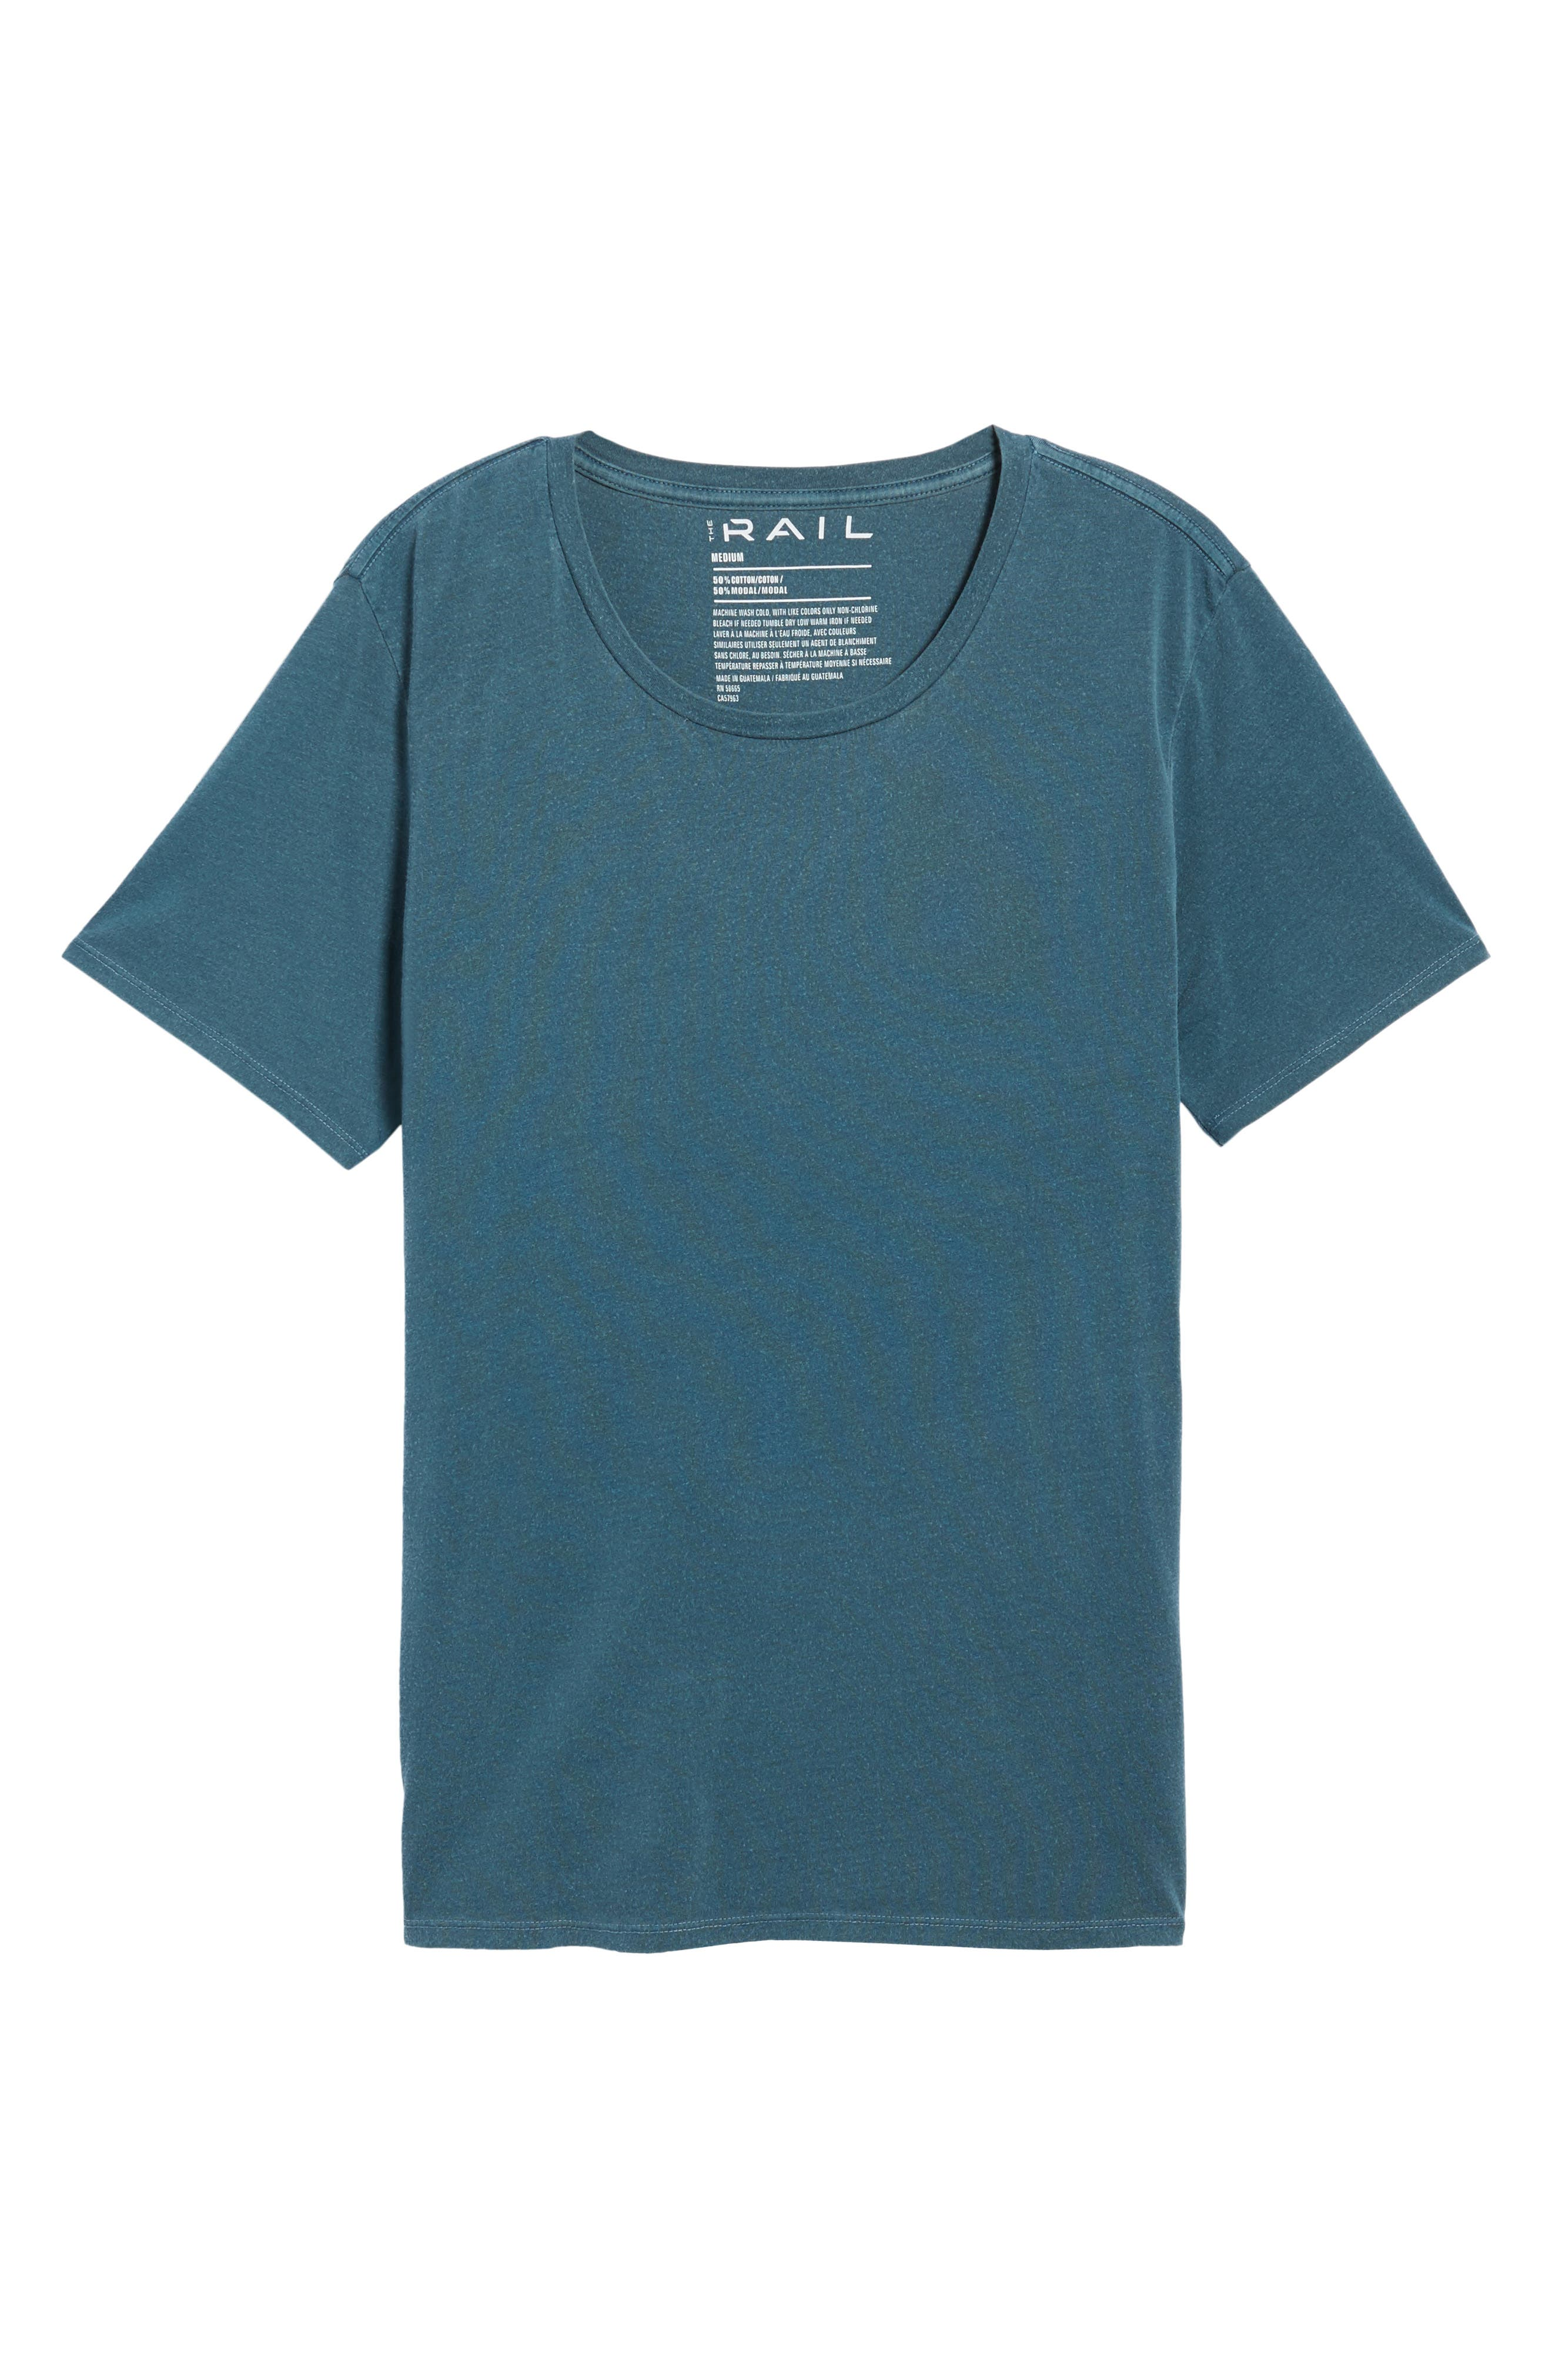 Alternate Image 6  - The Rail Slim Fit Scoop Neck T-Shirt